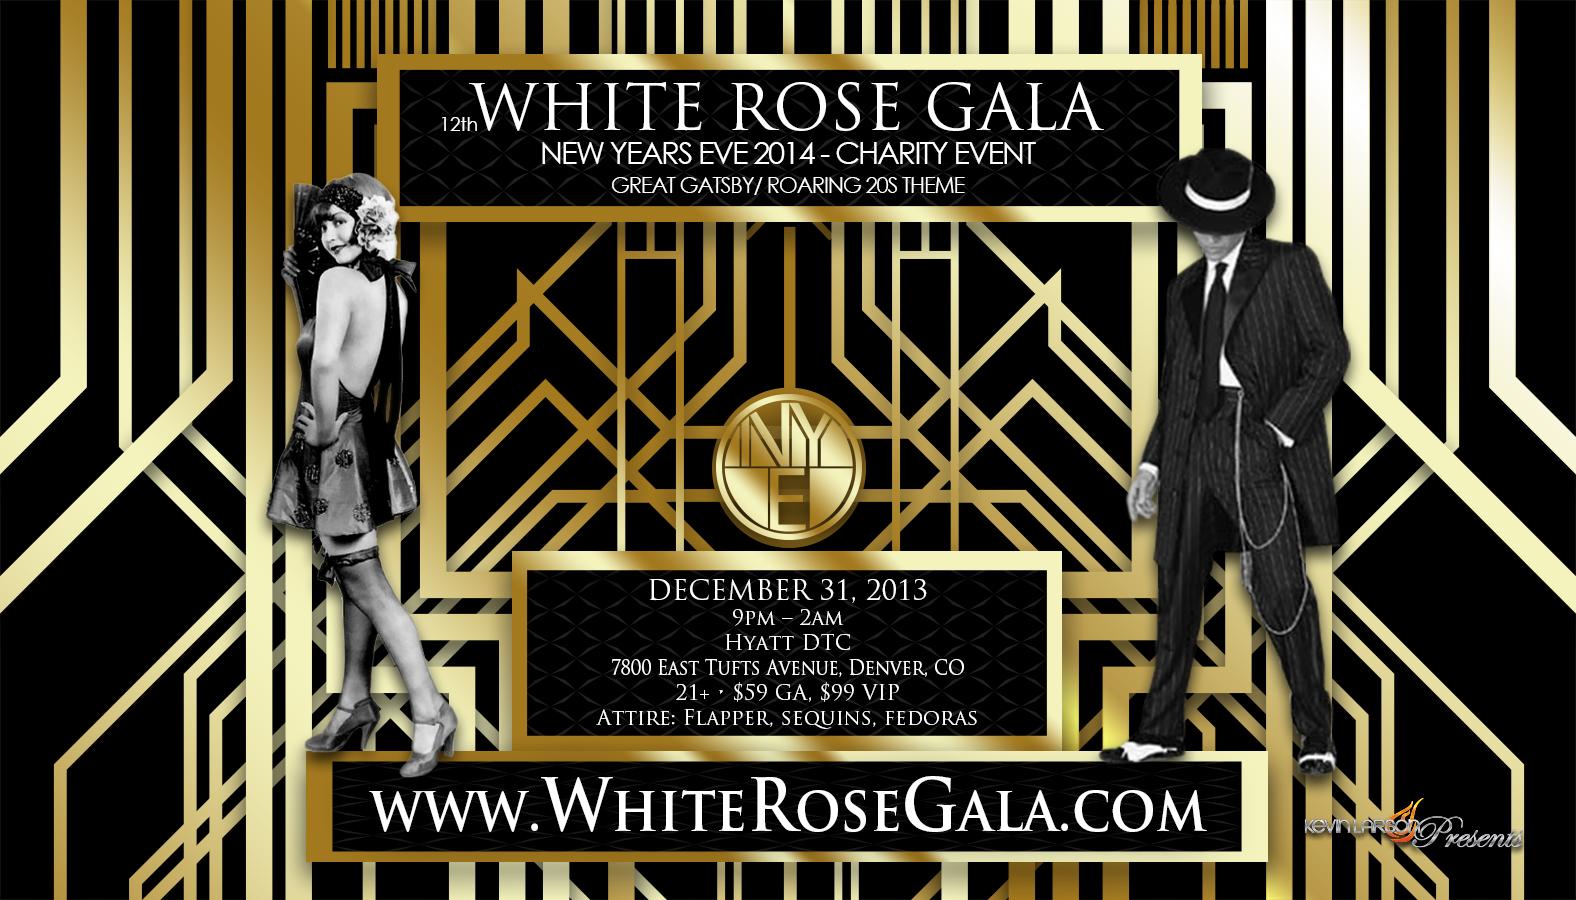 White Rose Gala NYE 12th Annual Tickets, Tue, Dec 31, 2013 ...